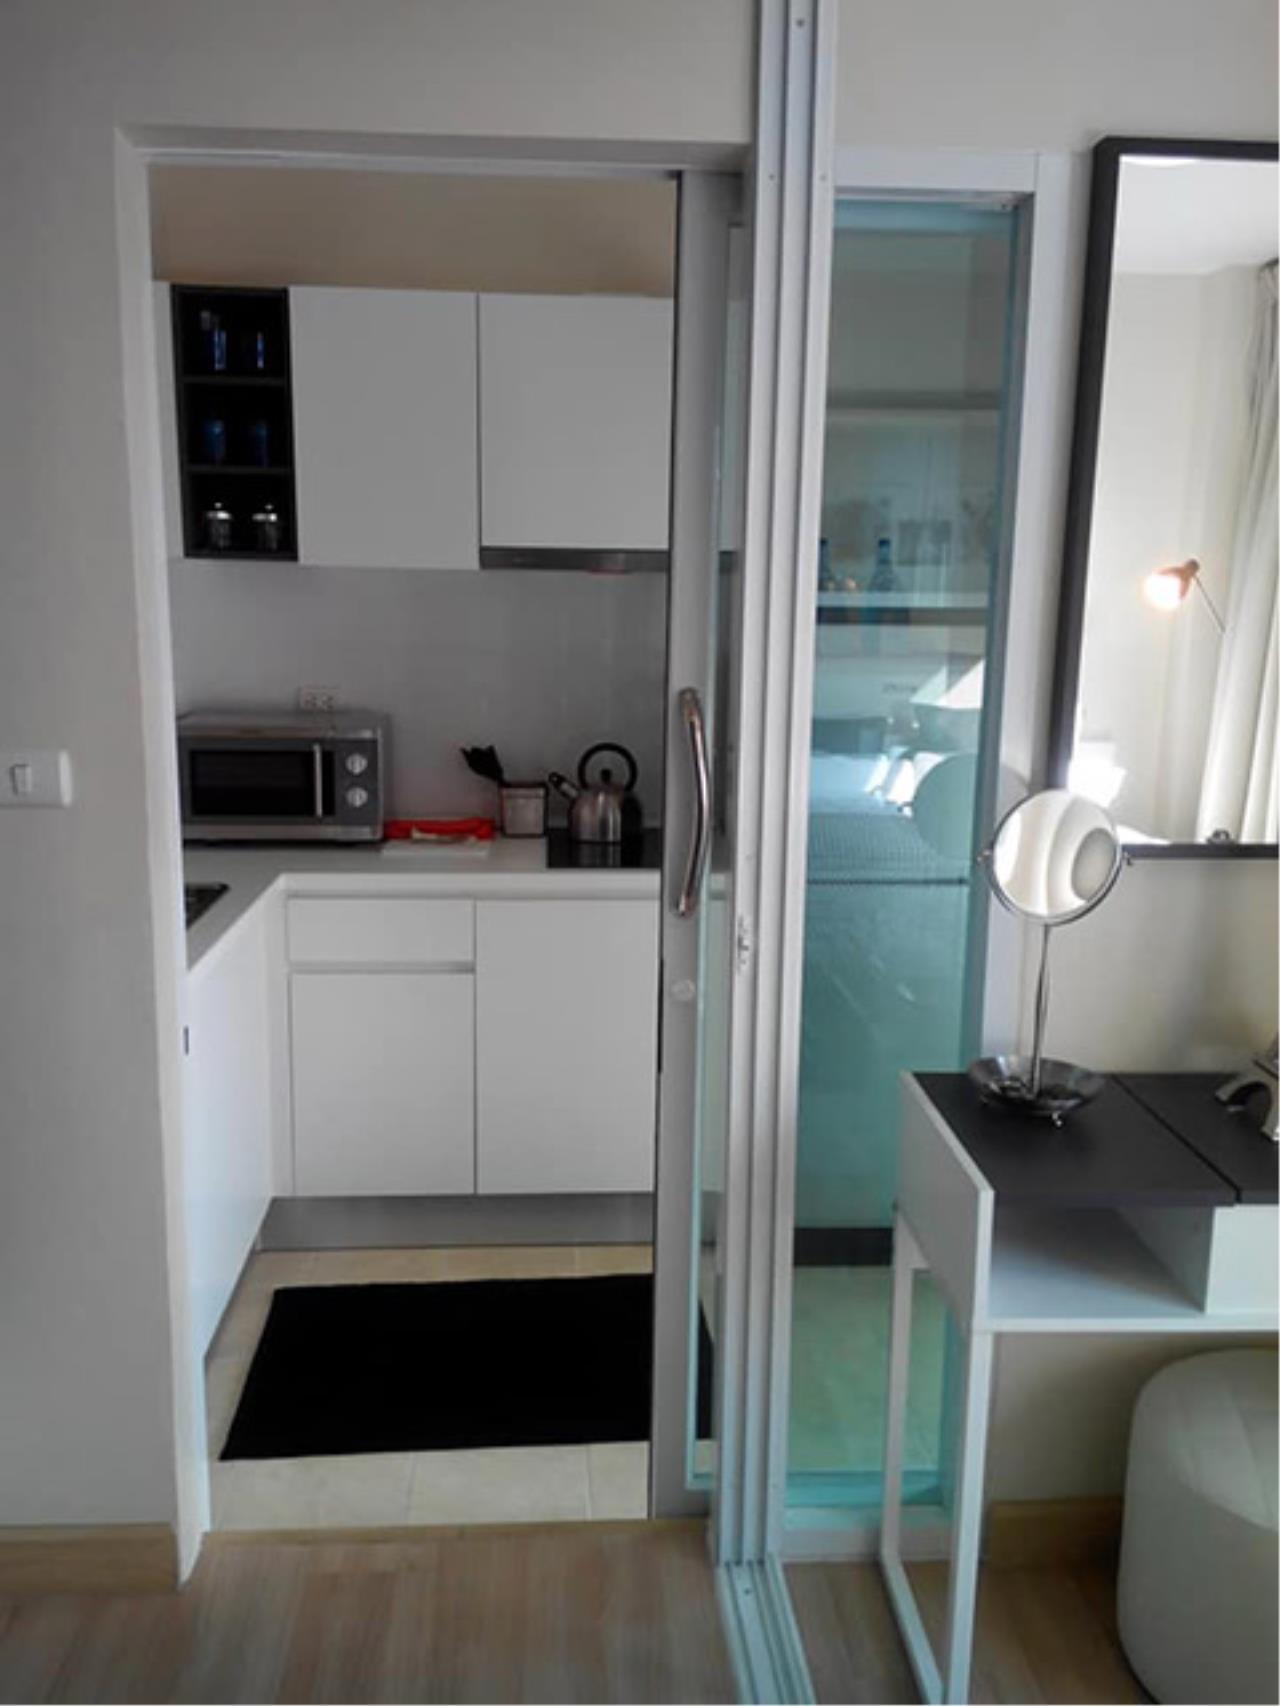 Agent - Sarunya jantanakorn Agency's BE0117 Condo for Sale Kris Garden Rama 9 fl.6th 33 sqm 1 bed near MRT Rama 9 5